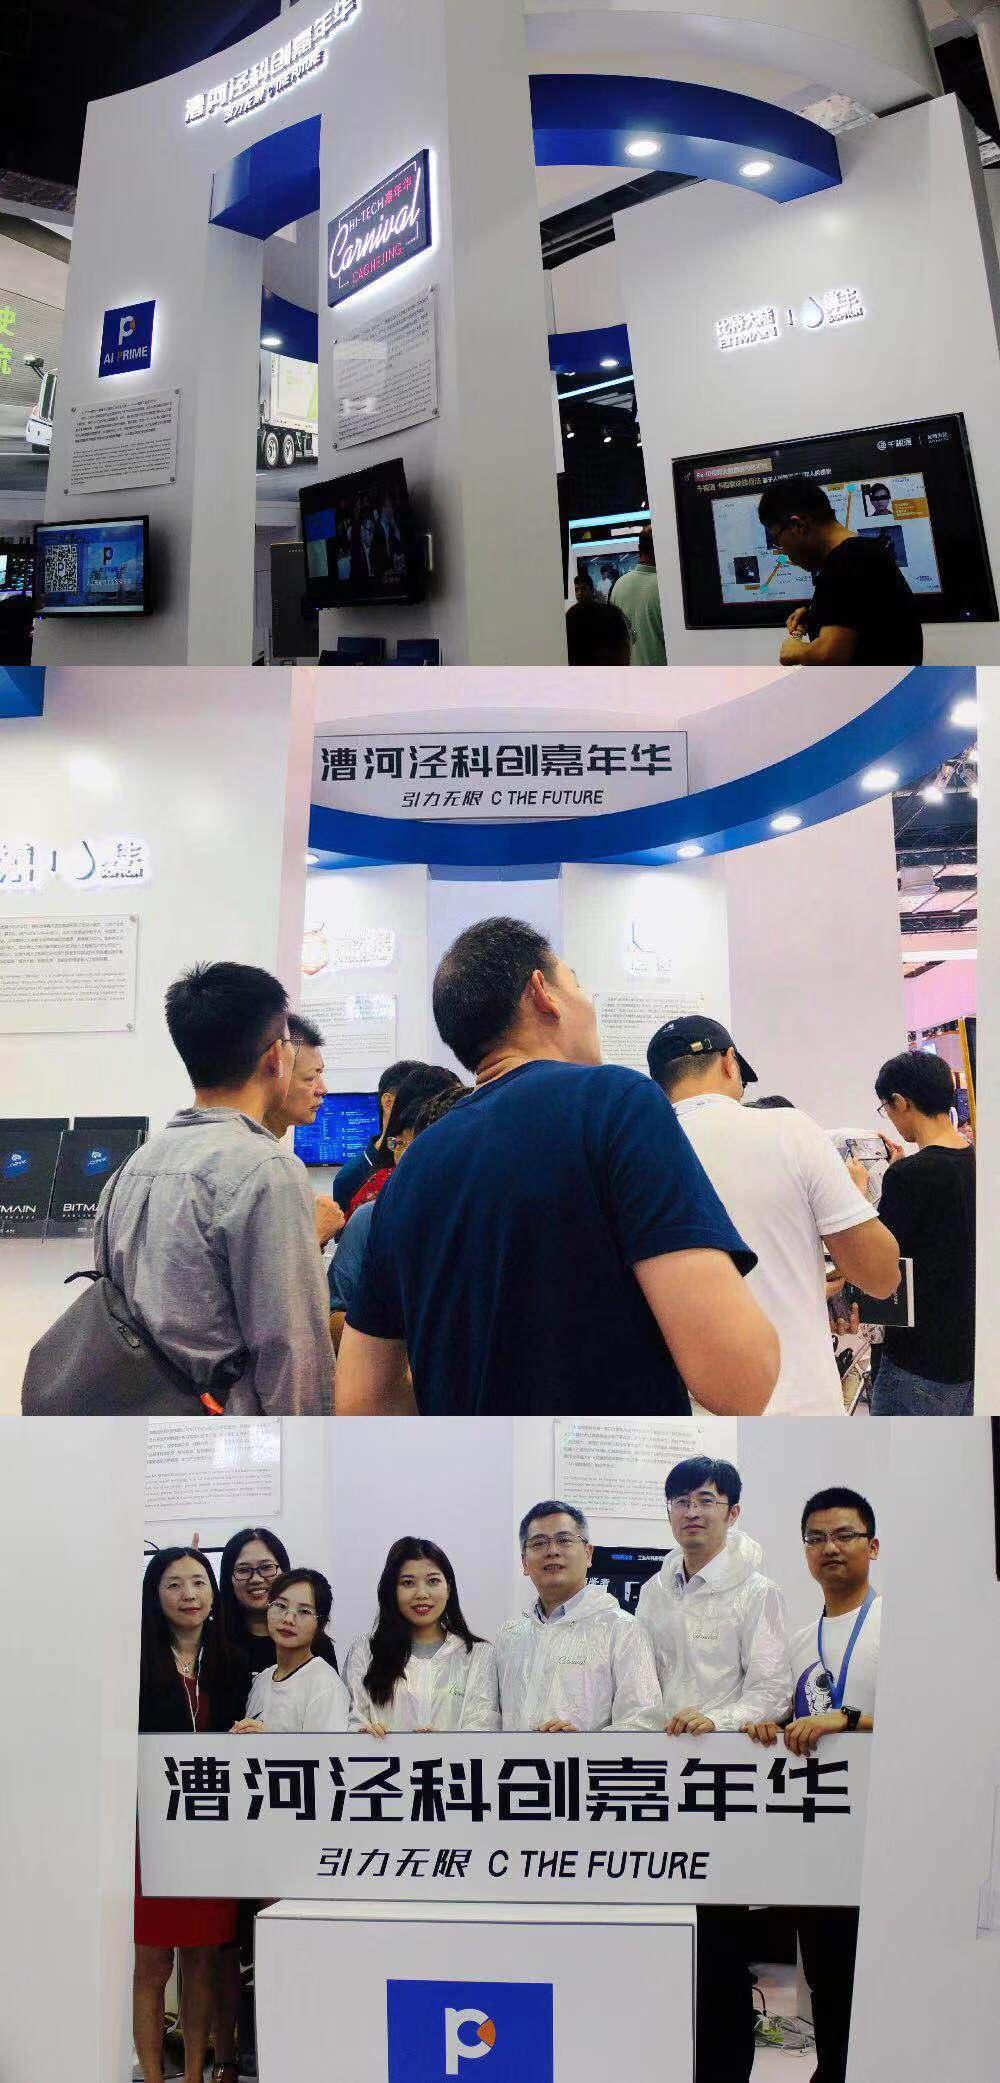 2019WAIC丨漕河泾科创嘉年华携三大尖端AI企业展现AI新时代